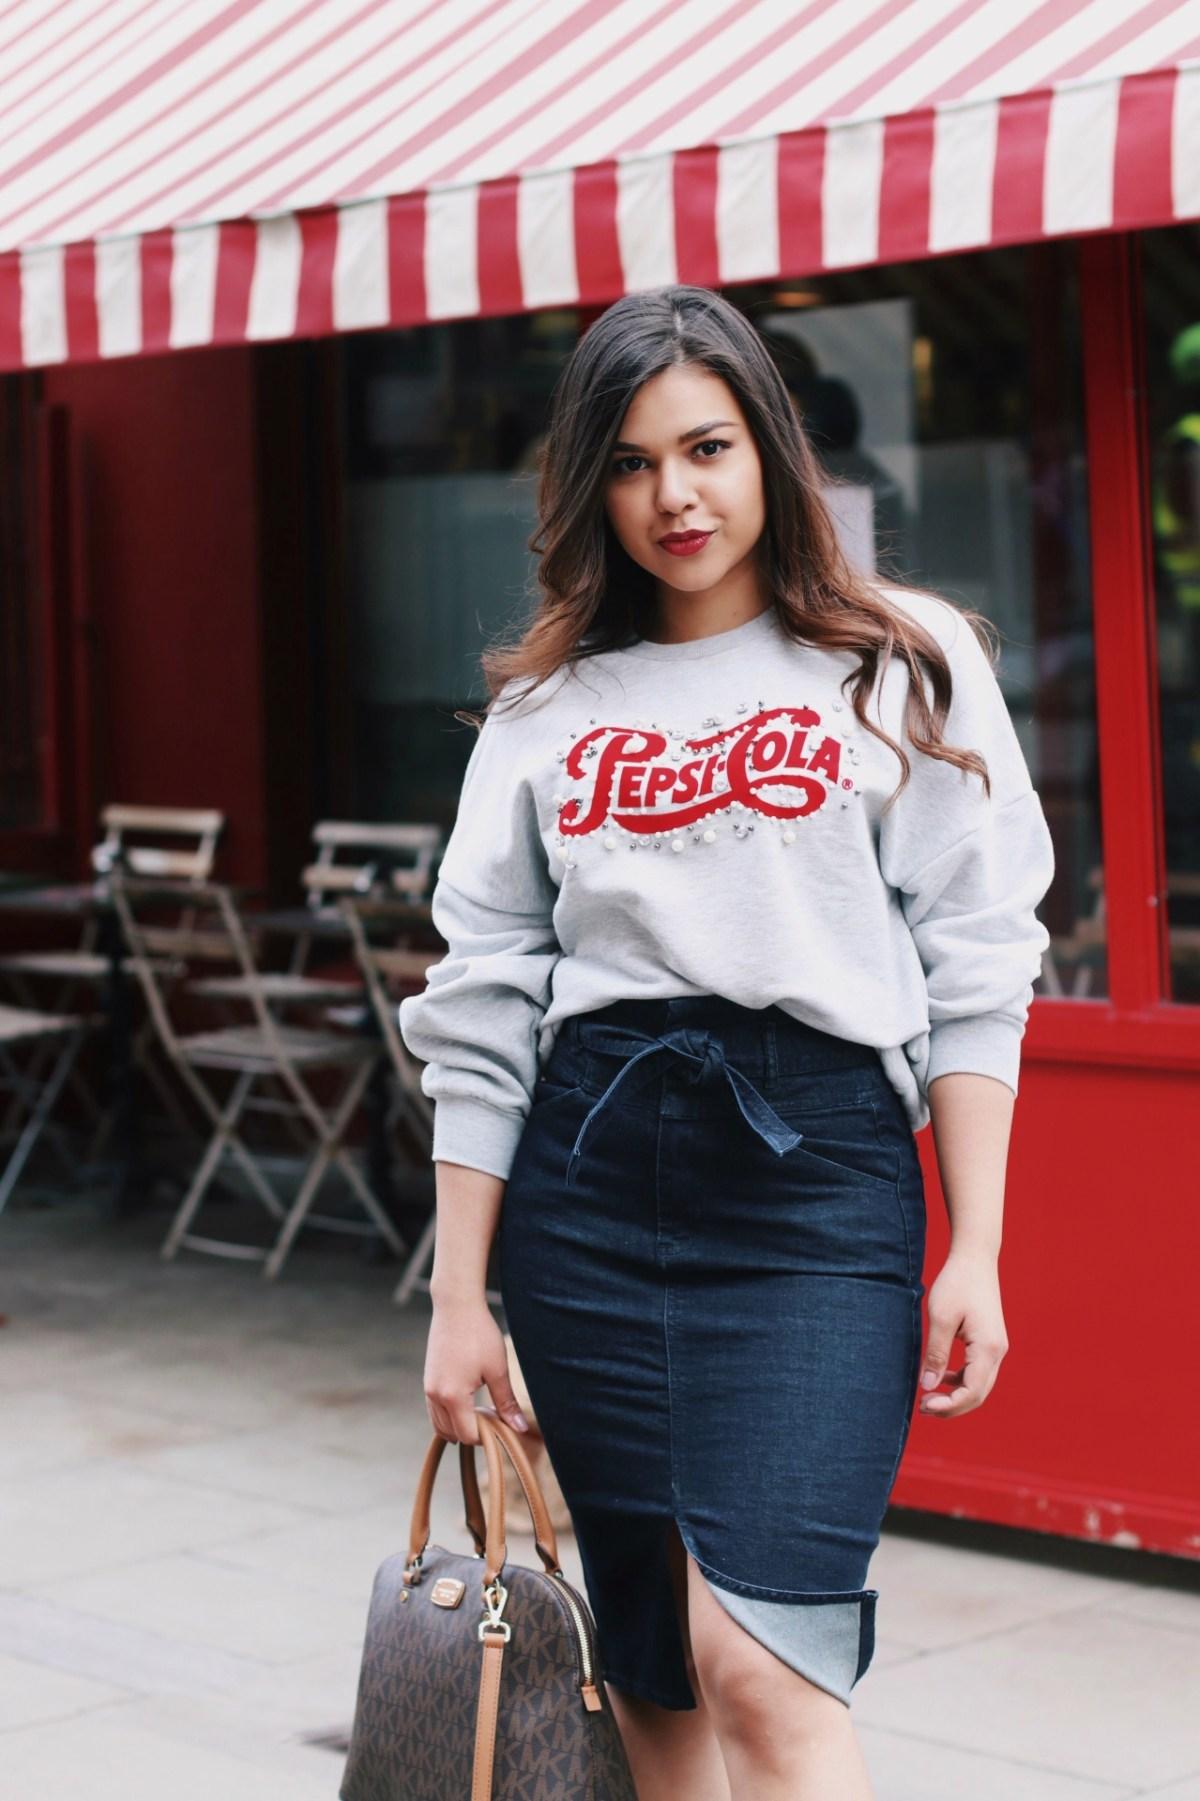 Denim pencil skirt outfit 2018 trends